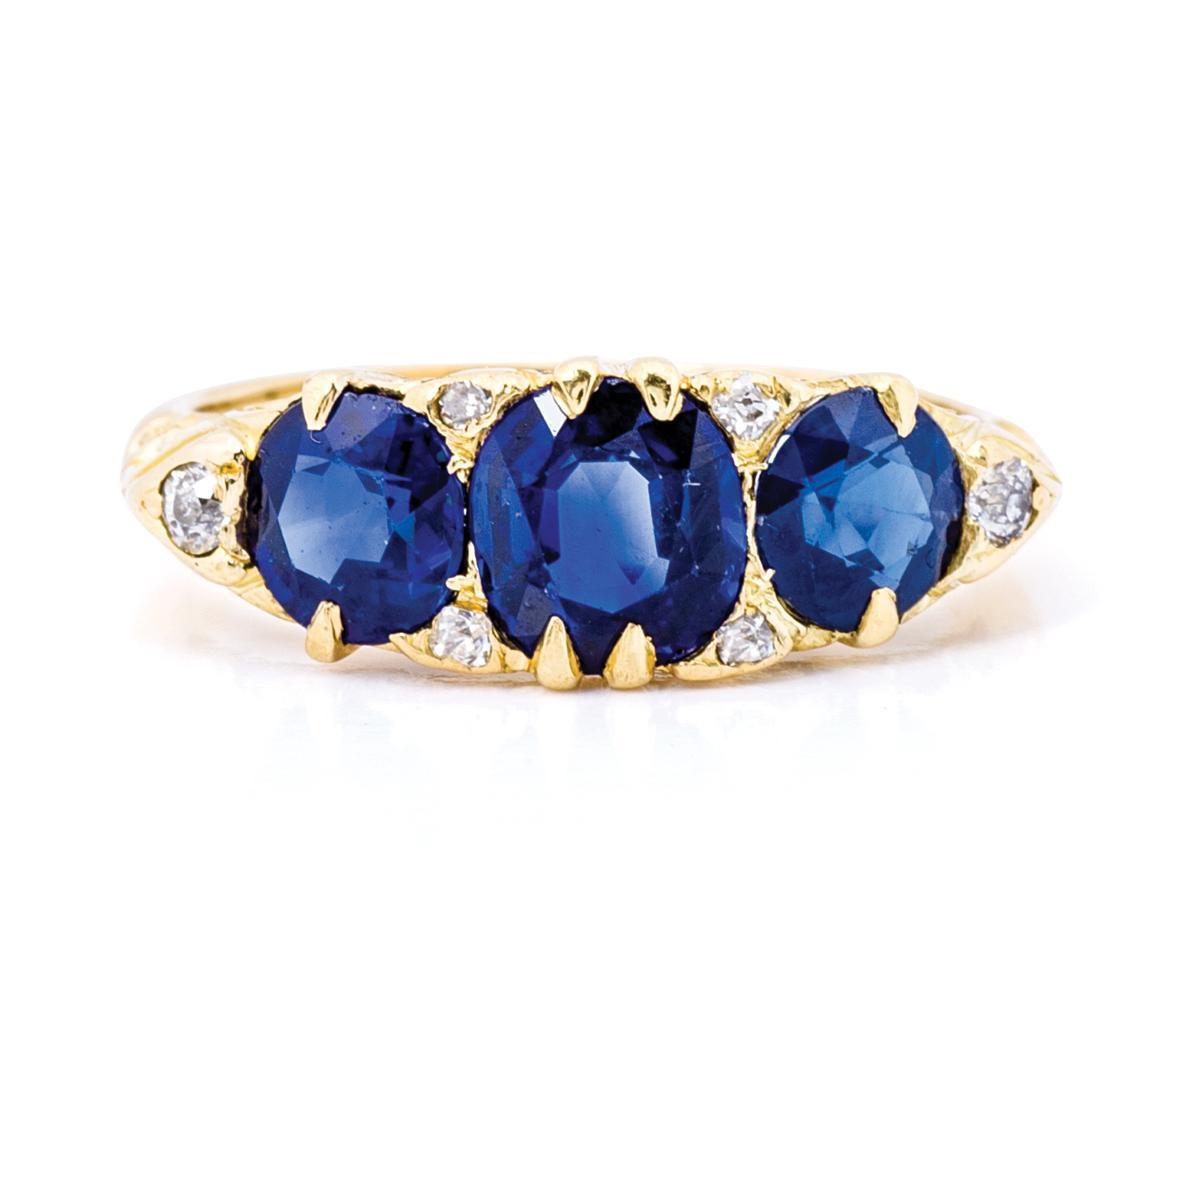 Antique Victorian 2.44 CTW Sapphire Ring